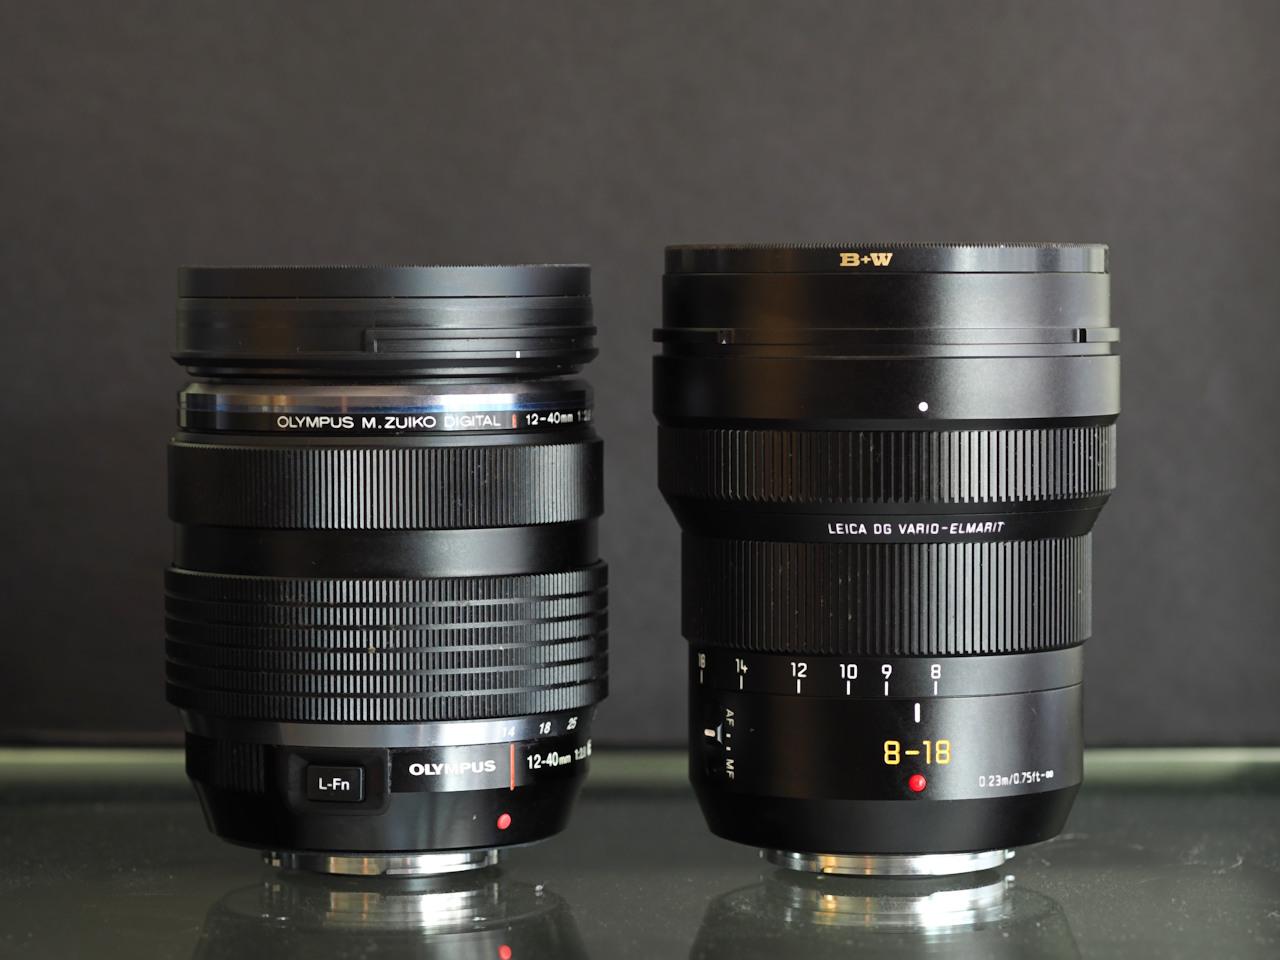 wrotniak net: Leica DG 8-18 mm F/2 8-4 0